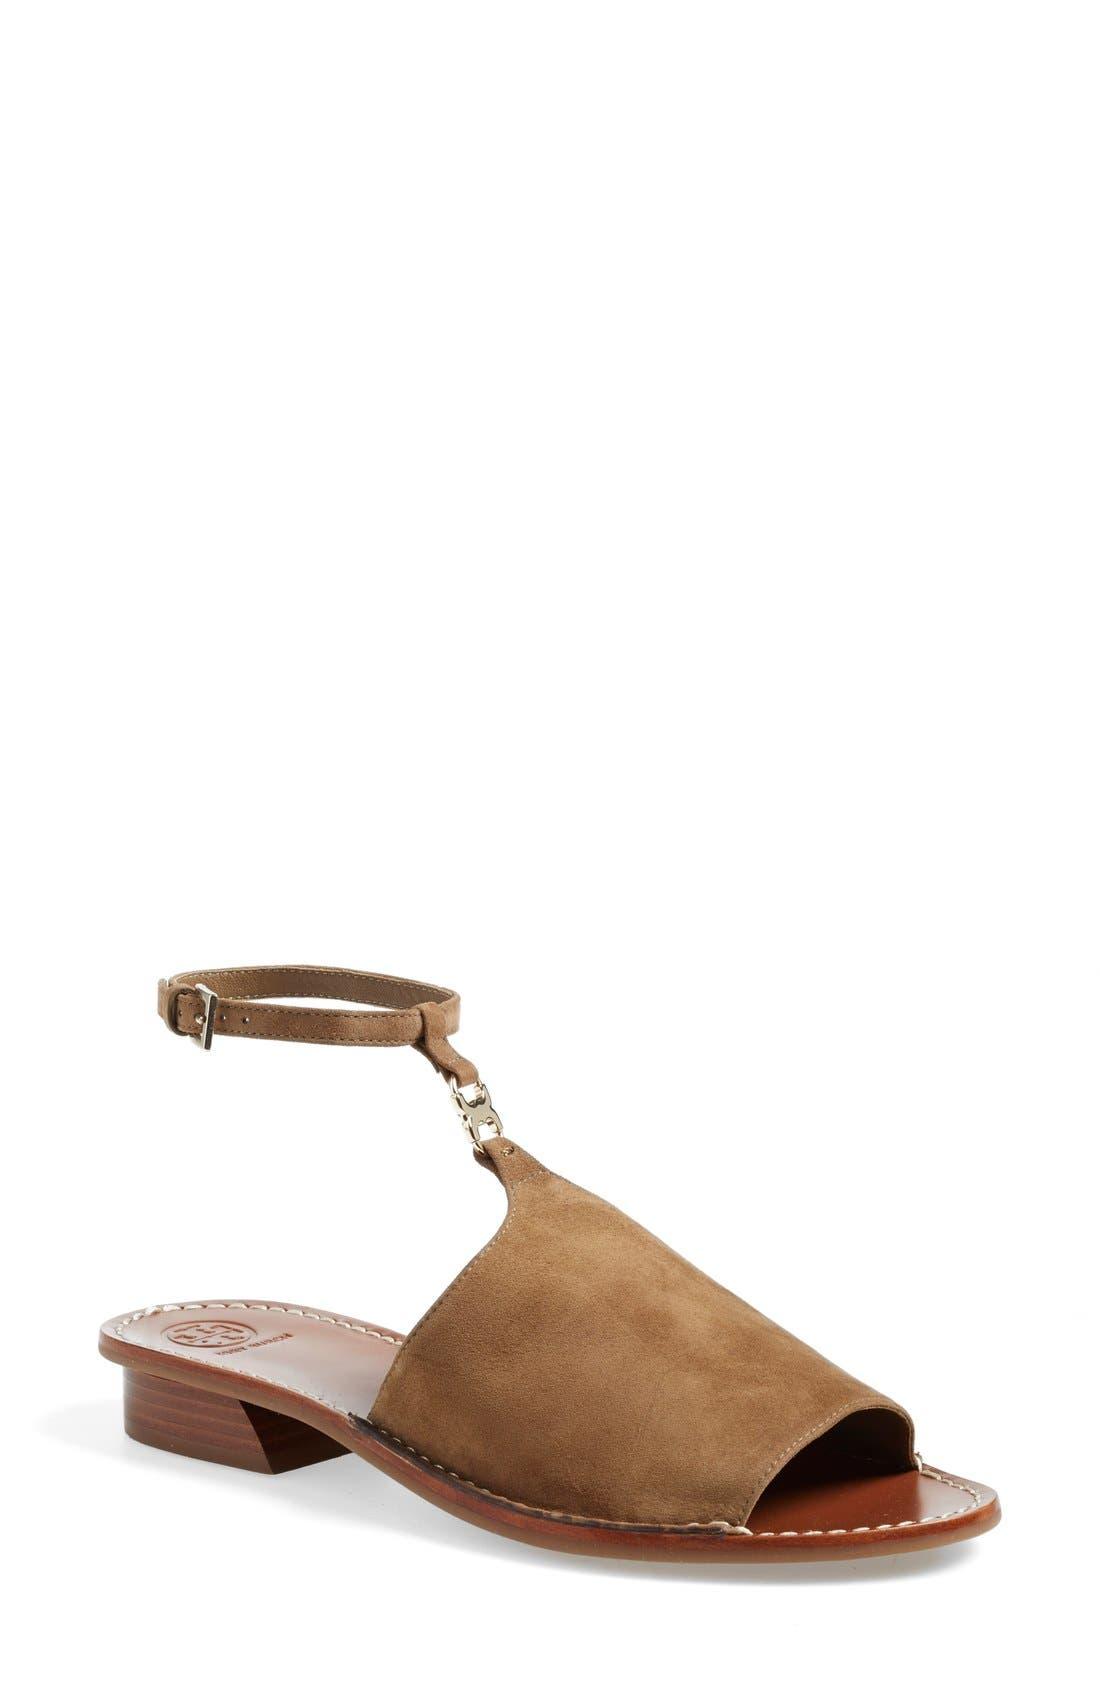 Alternate Image 1 Selected - Tory Burch 'Gemini Link' Ankle Strap Sandal (Women)